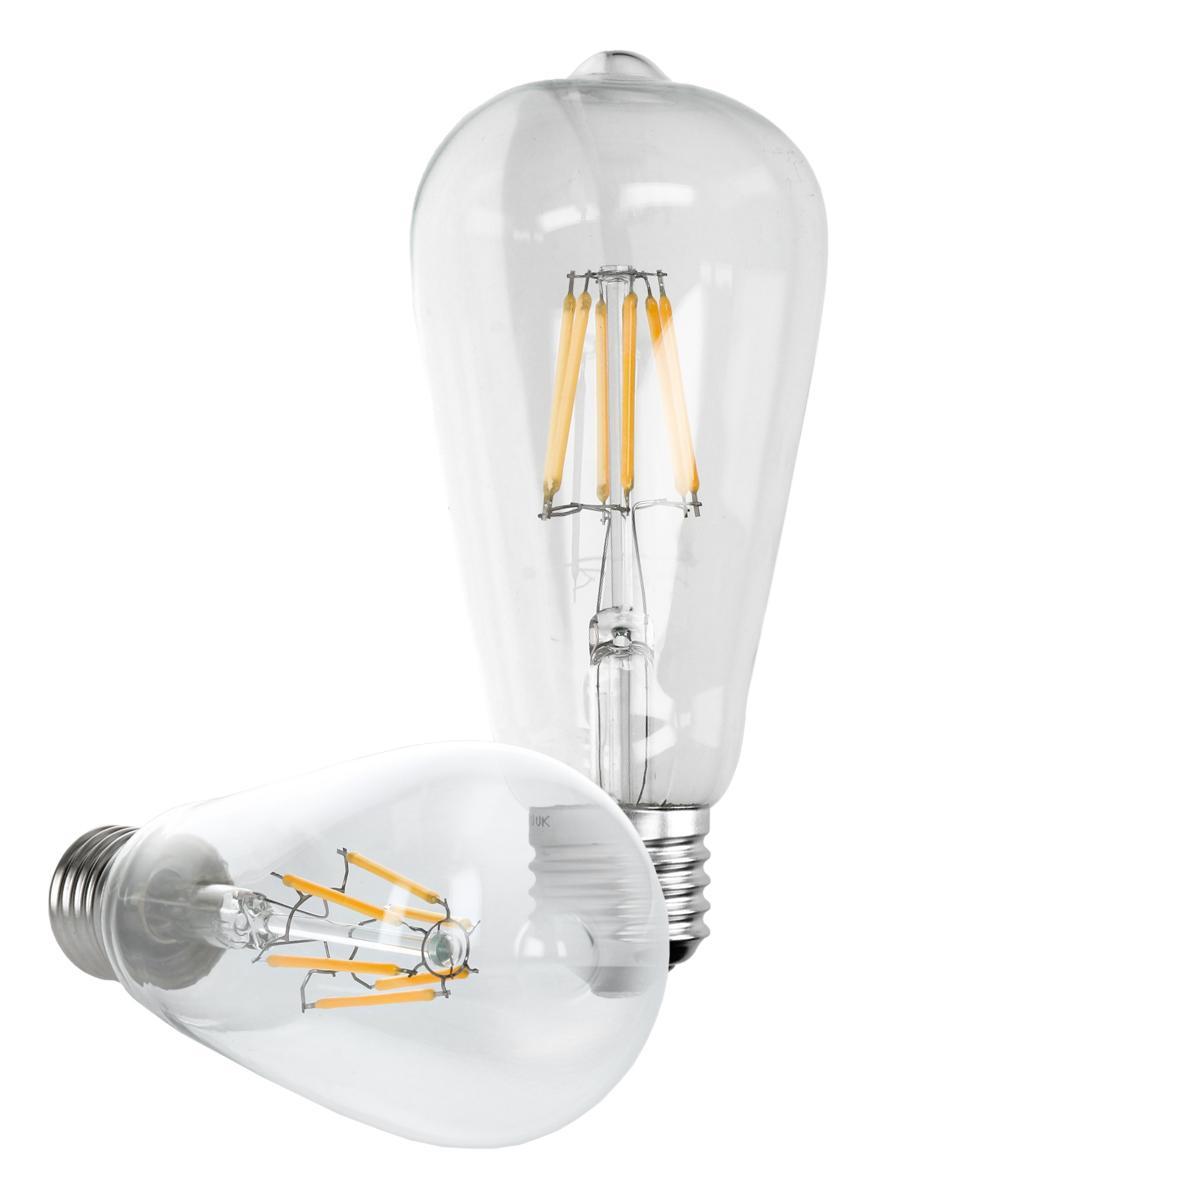 Ecd Germany ECD Germany 6 x Ampoule LED Filament E27 Classic Edison 6W 612 Lumens 120 ° Angle de faisceau AC 220-240V environ 40W am